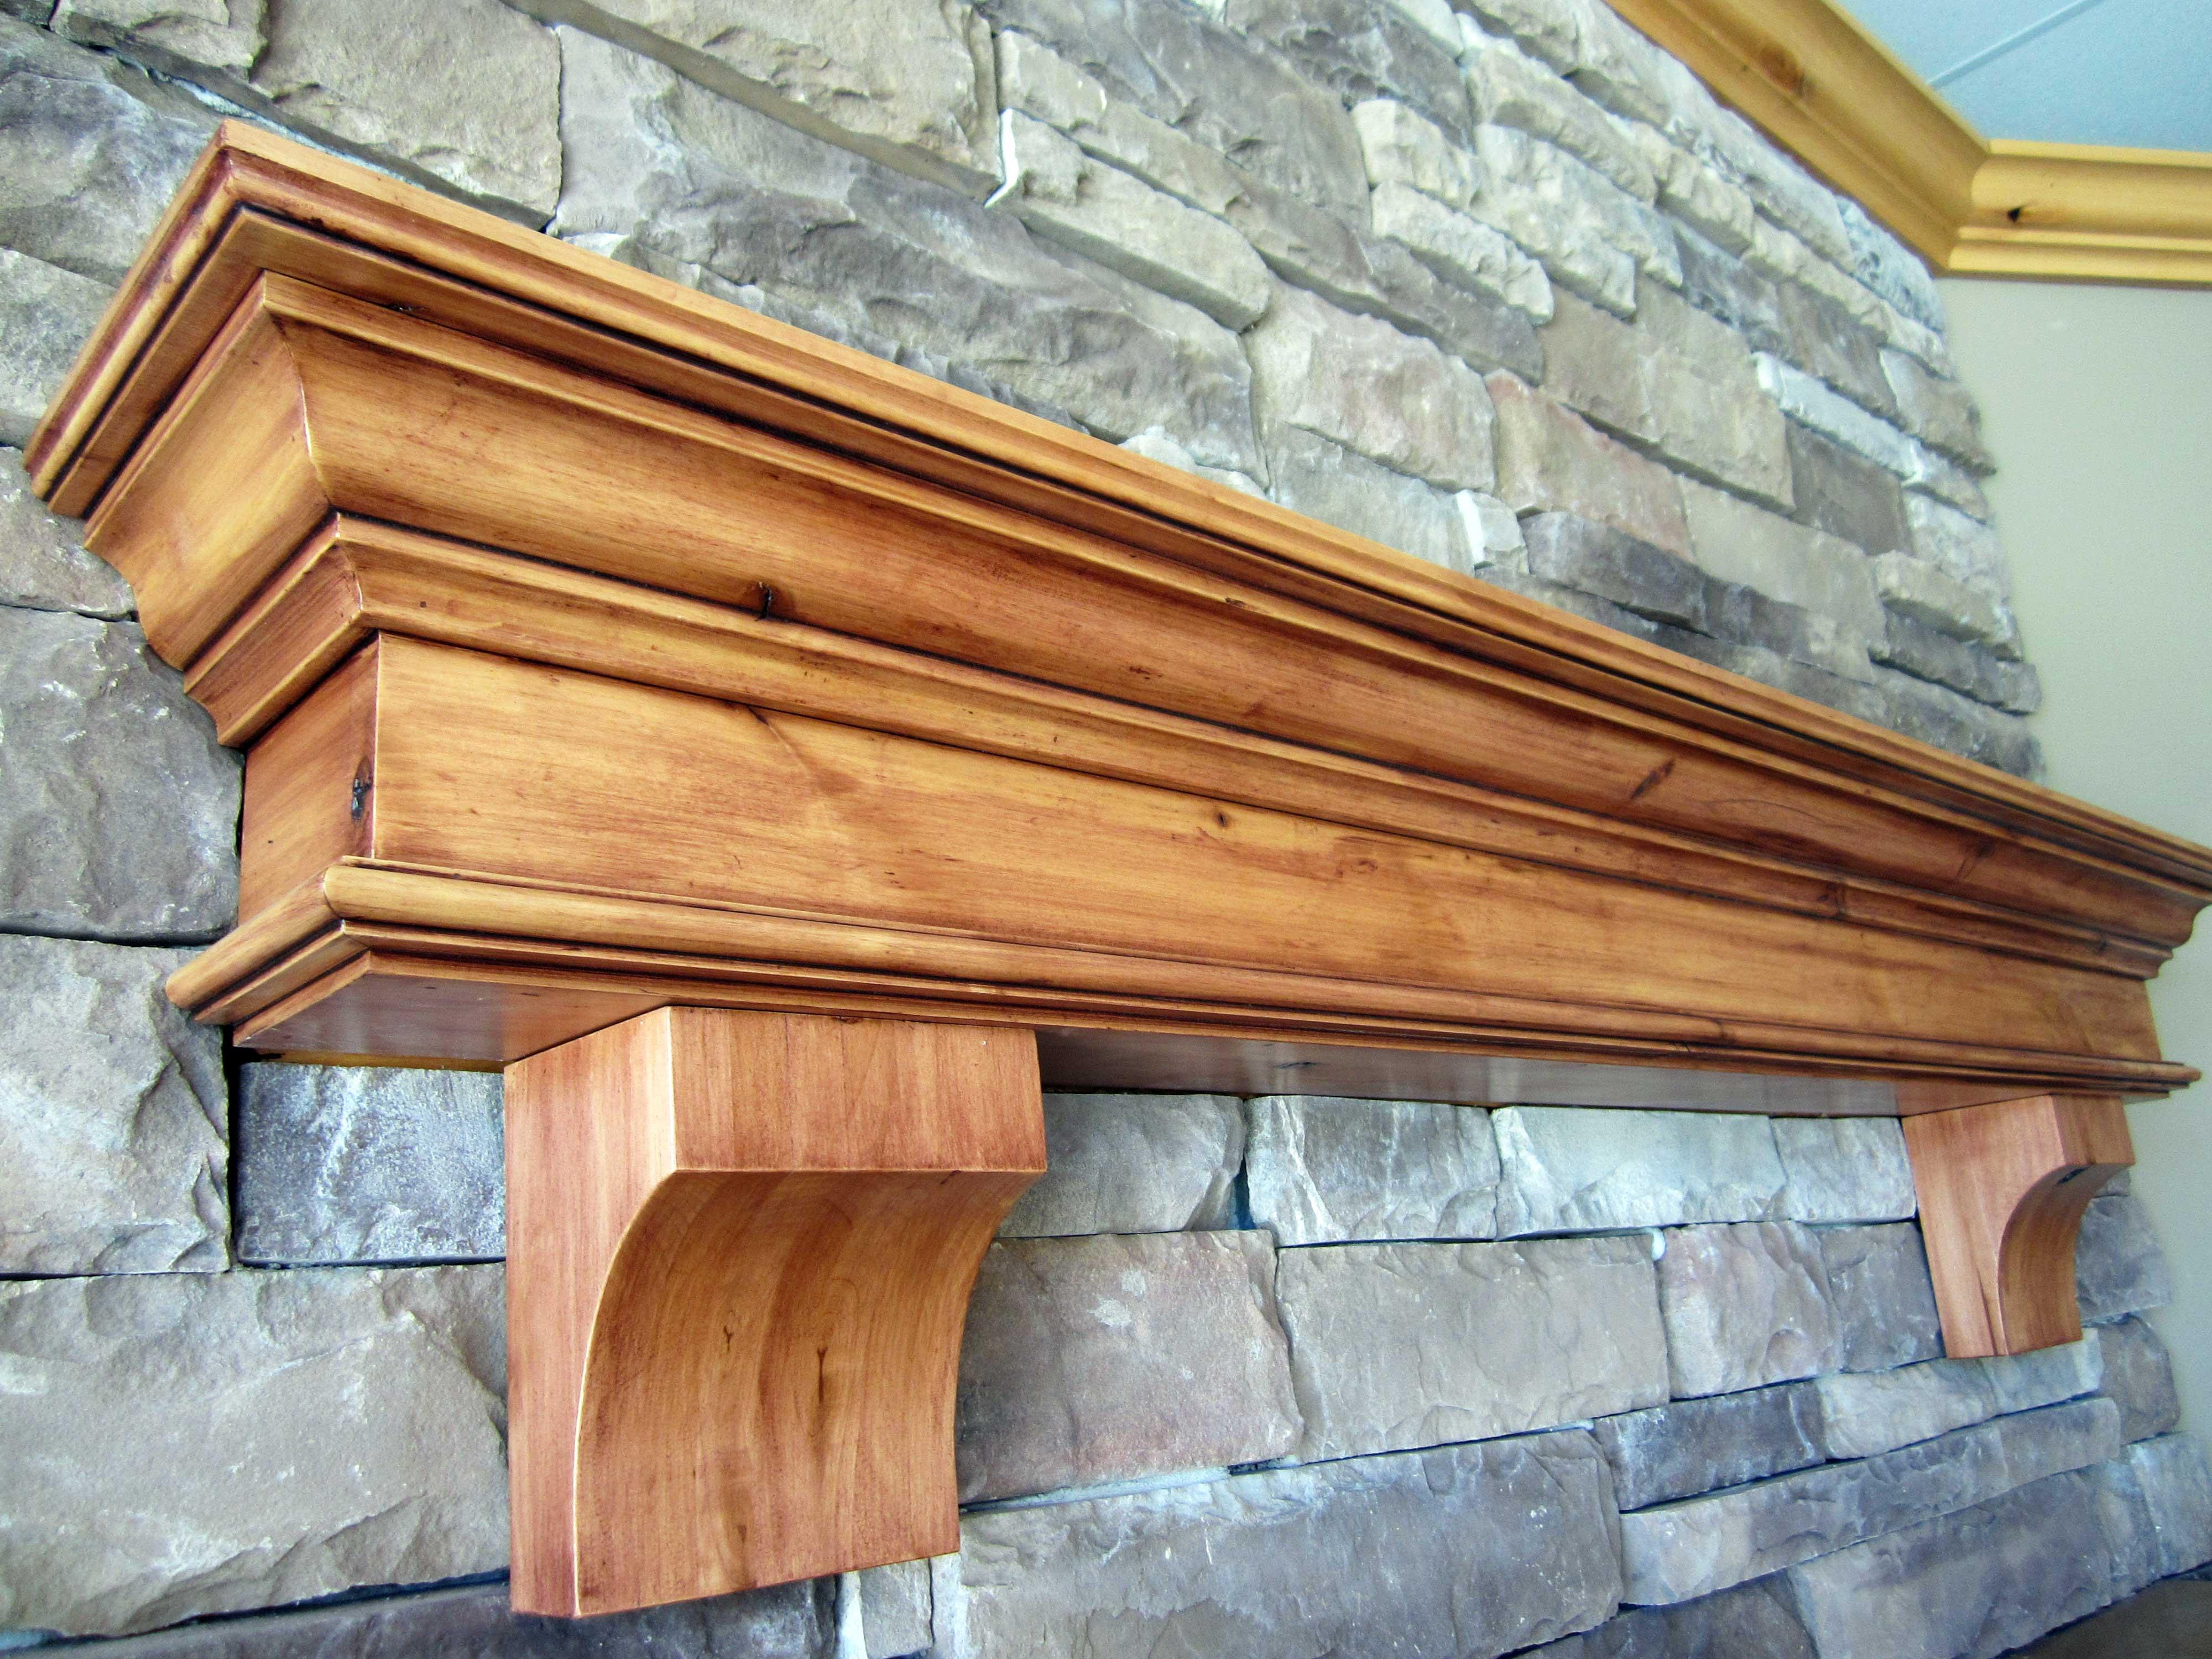 Summit iguana art designiguana art design - Types fireplace mantel shelves choose ...